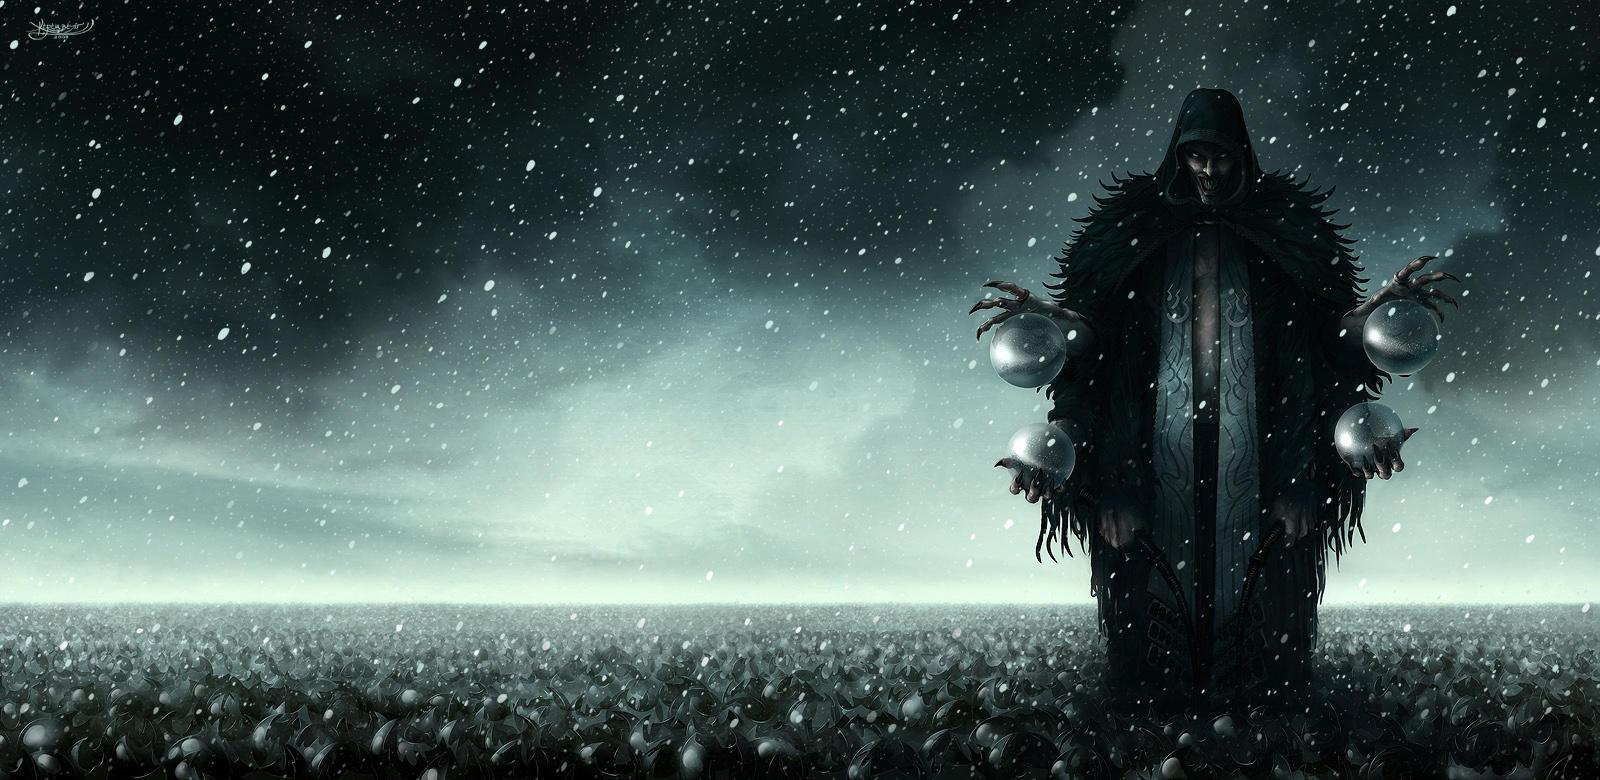 Snowfall Cover Art by kerembeyit